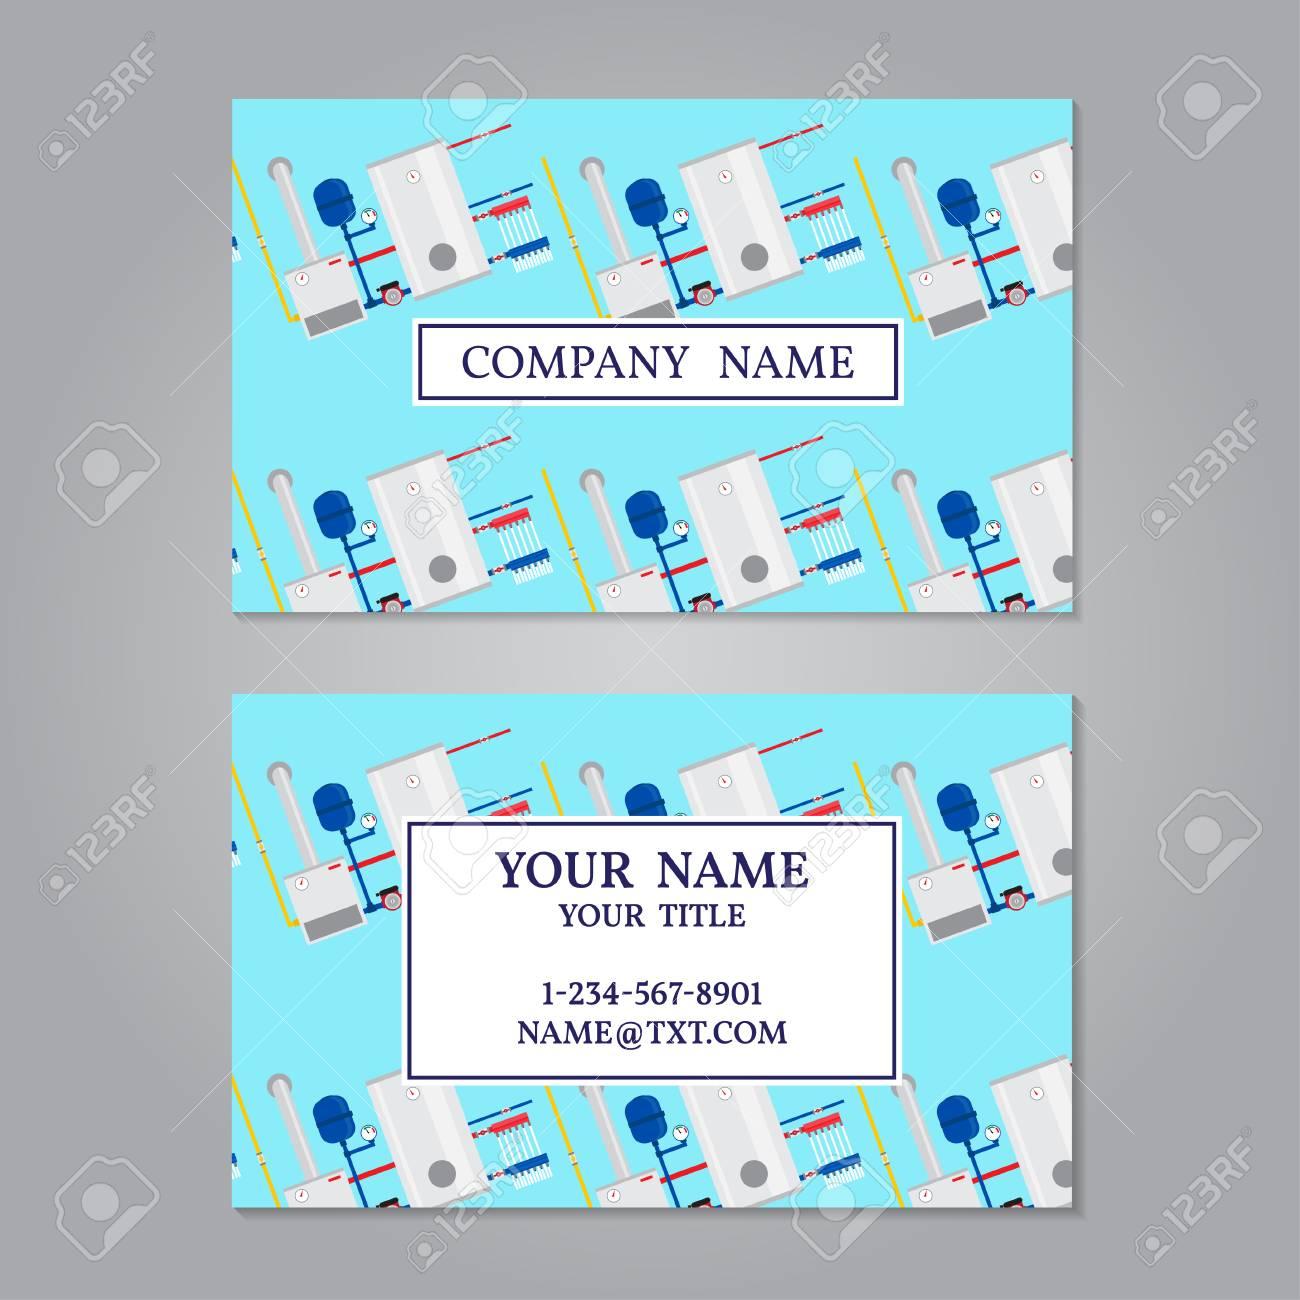 Creative Horizontal Business Card, Name Card Or Visiting Card ...